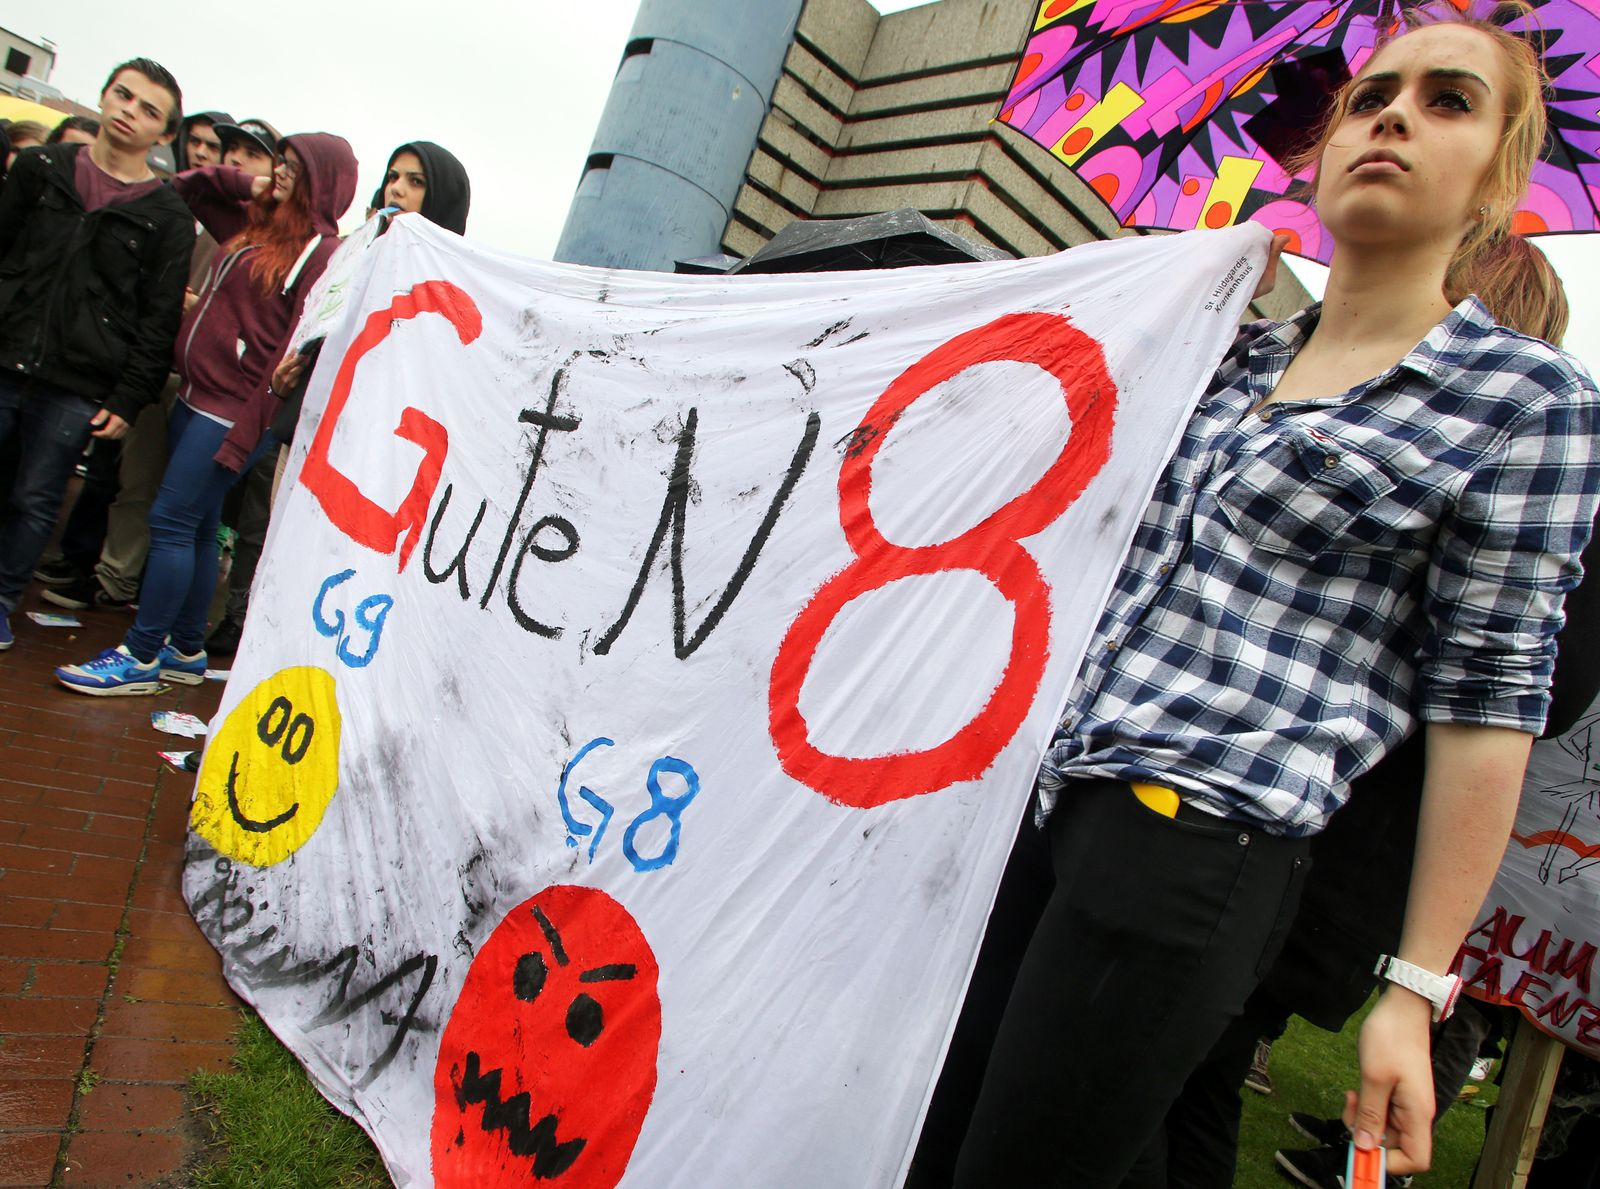 G8 / G9 / Gymnasium